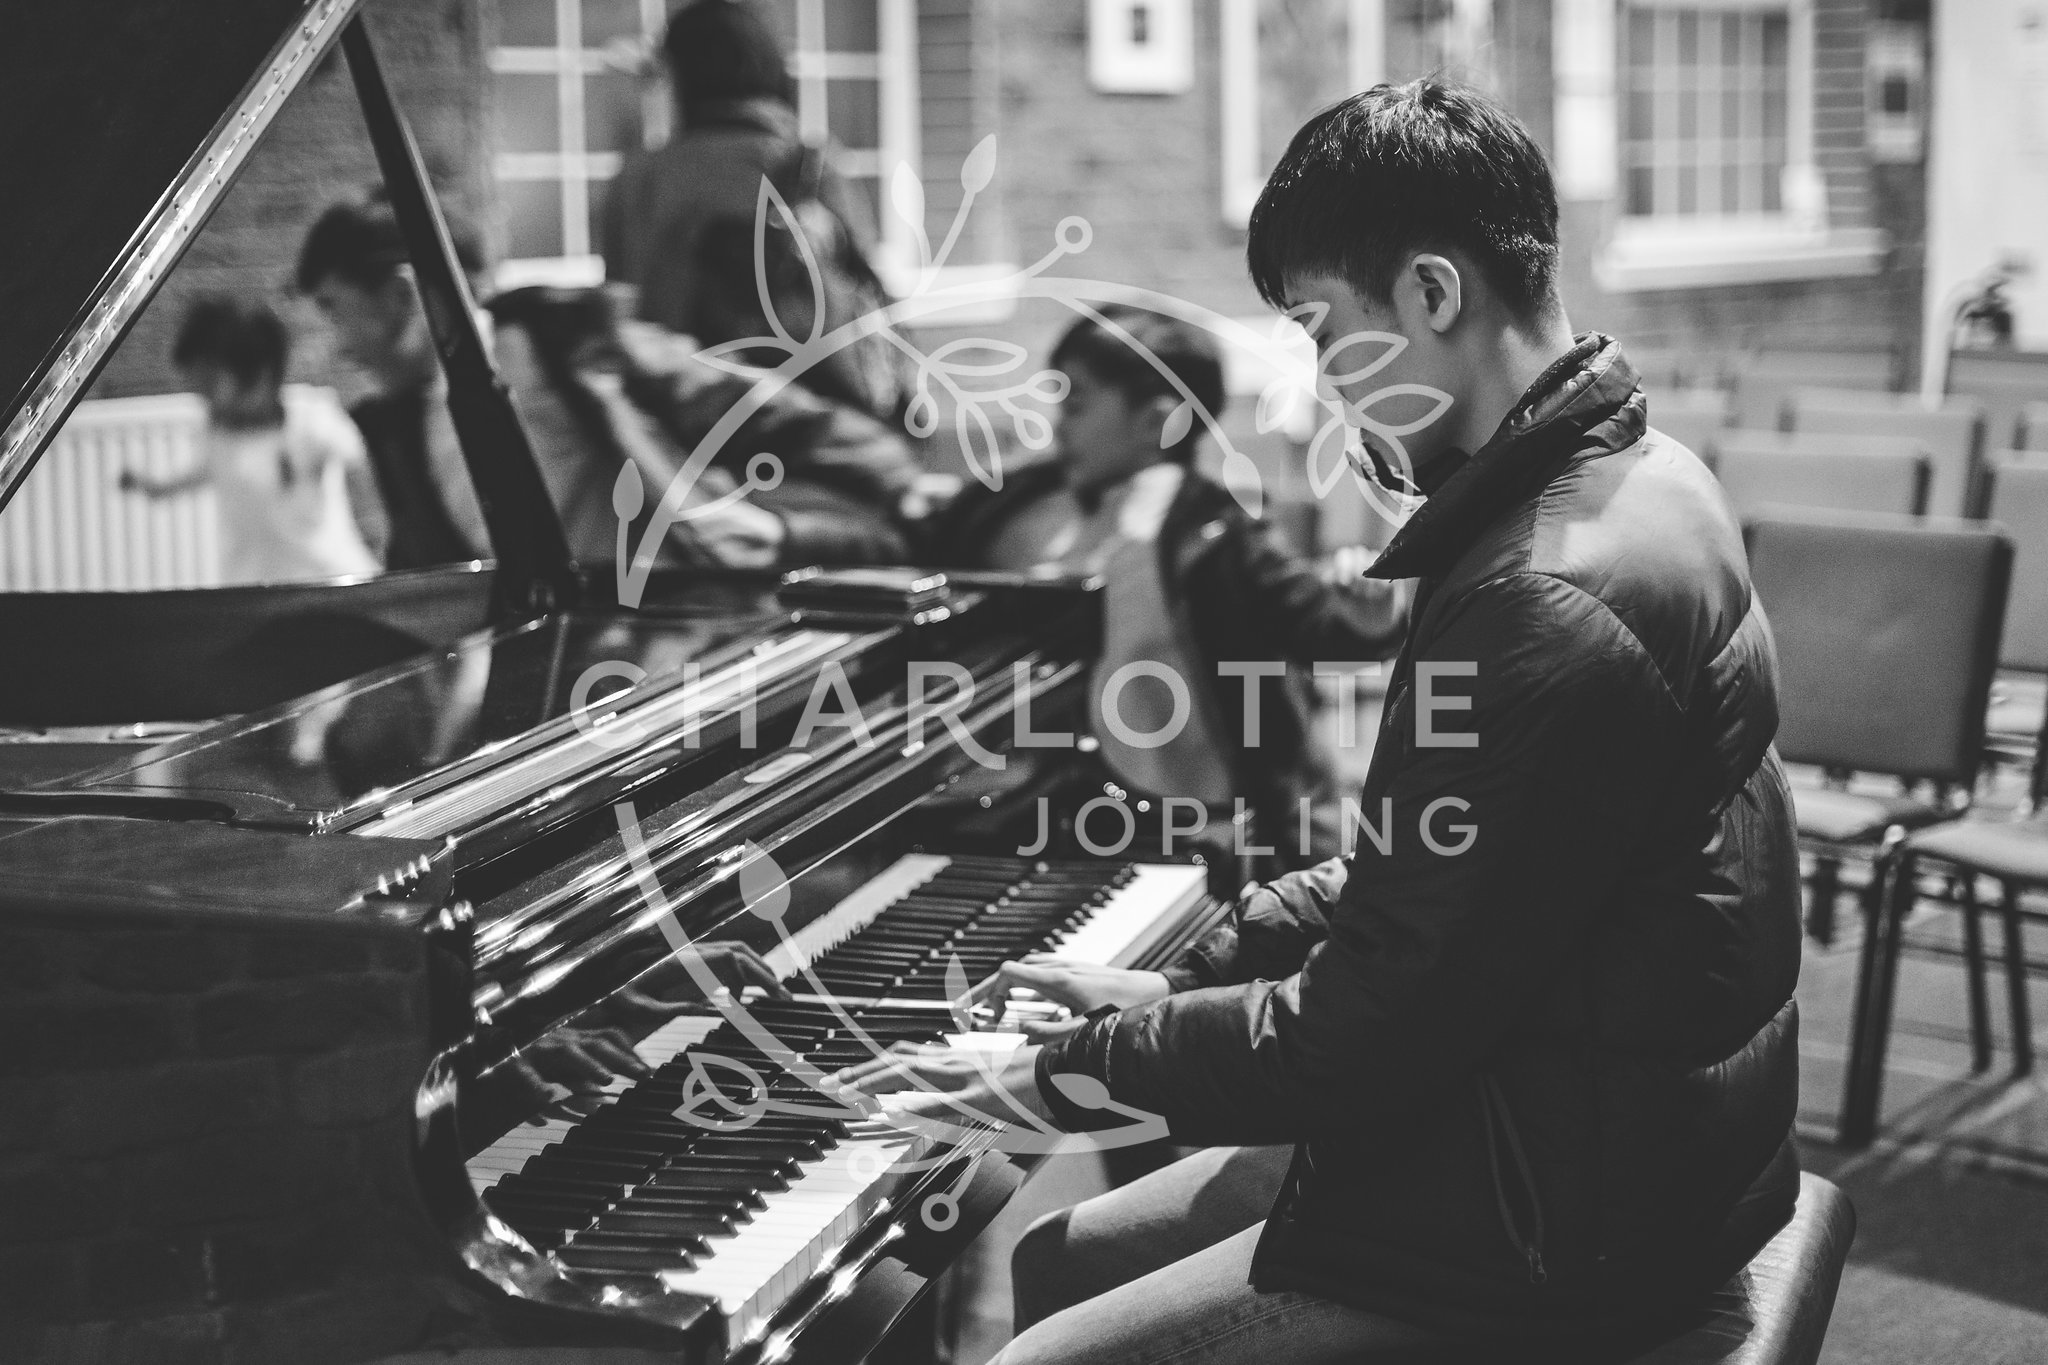 Stepping-Stones-Voicebox-Concert-2018-by-Charlotte-Jopling-111.jpg